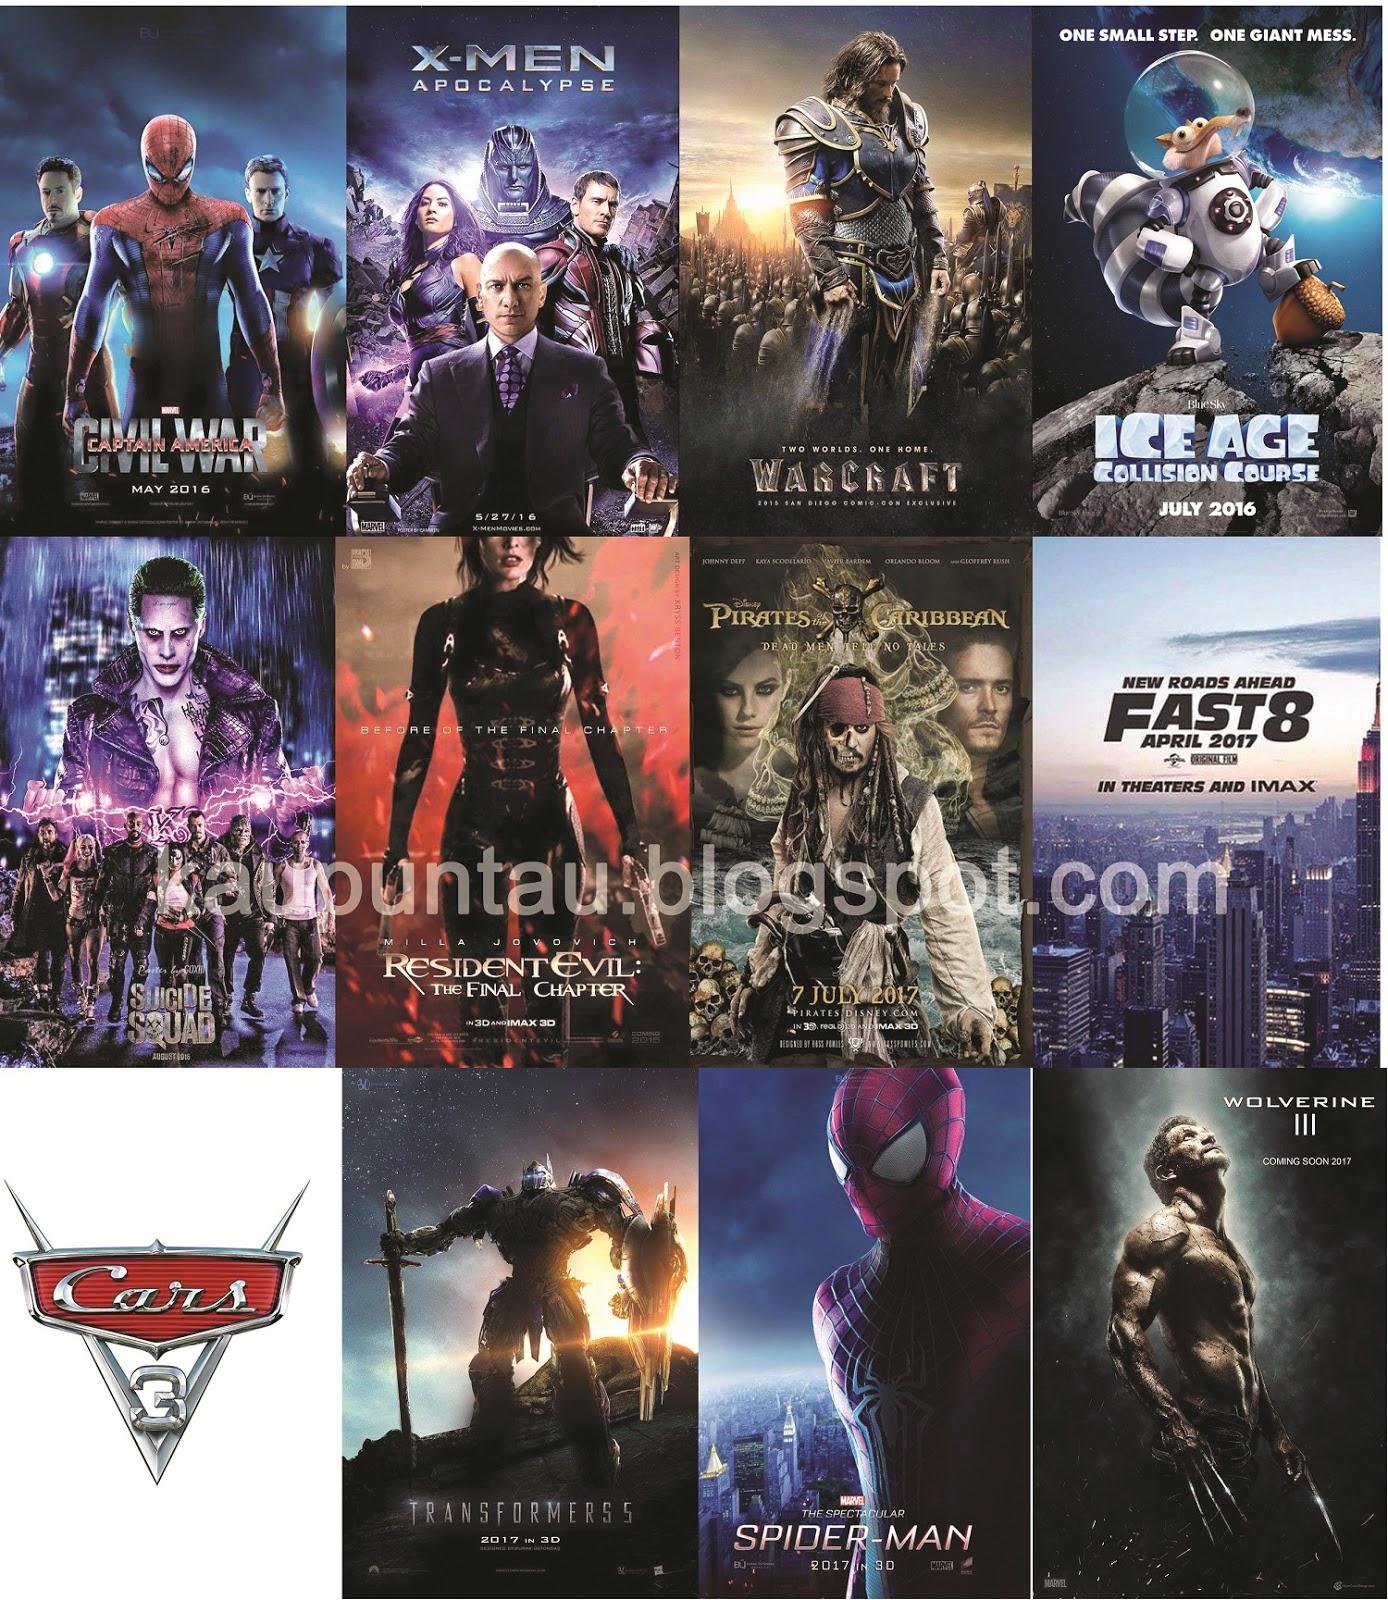 Daftar Film Hollywood Terbaru 2016 - 2017 - Kaupun Tau